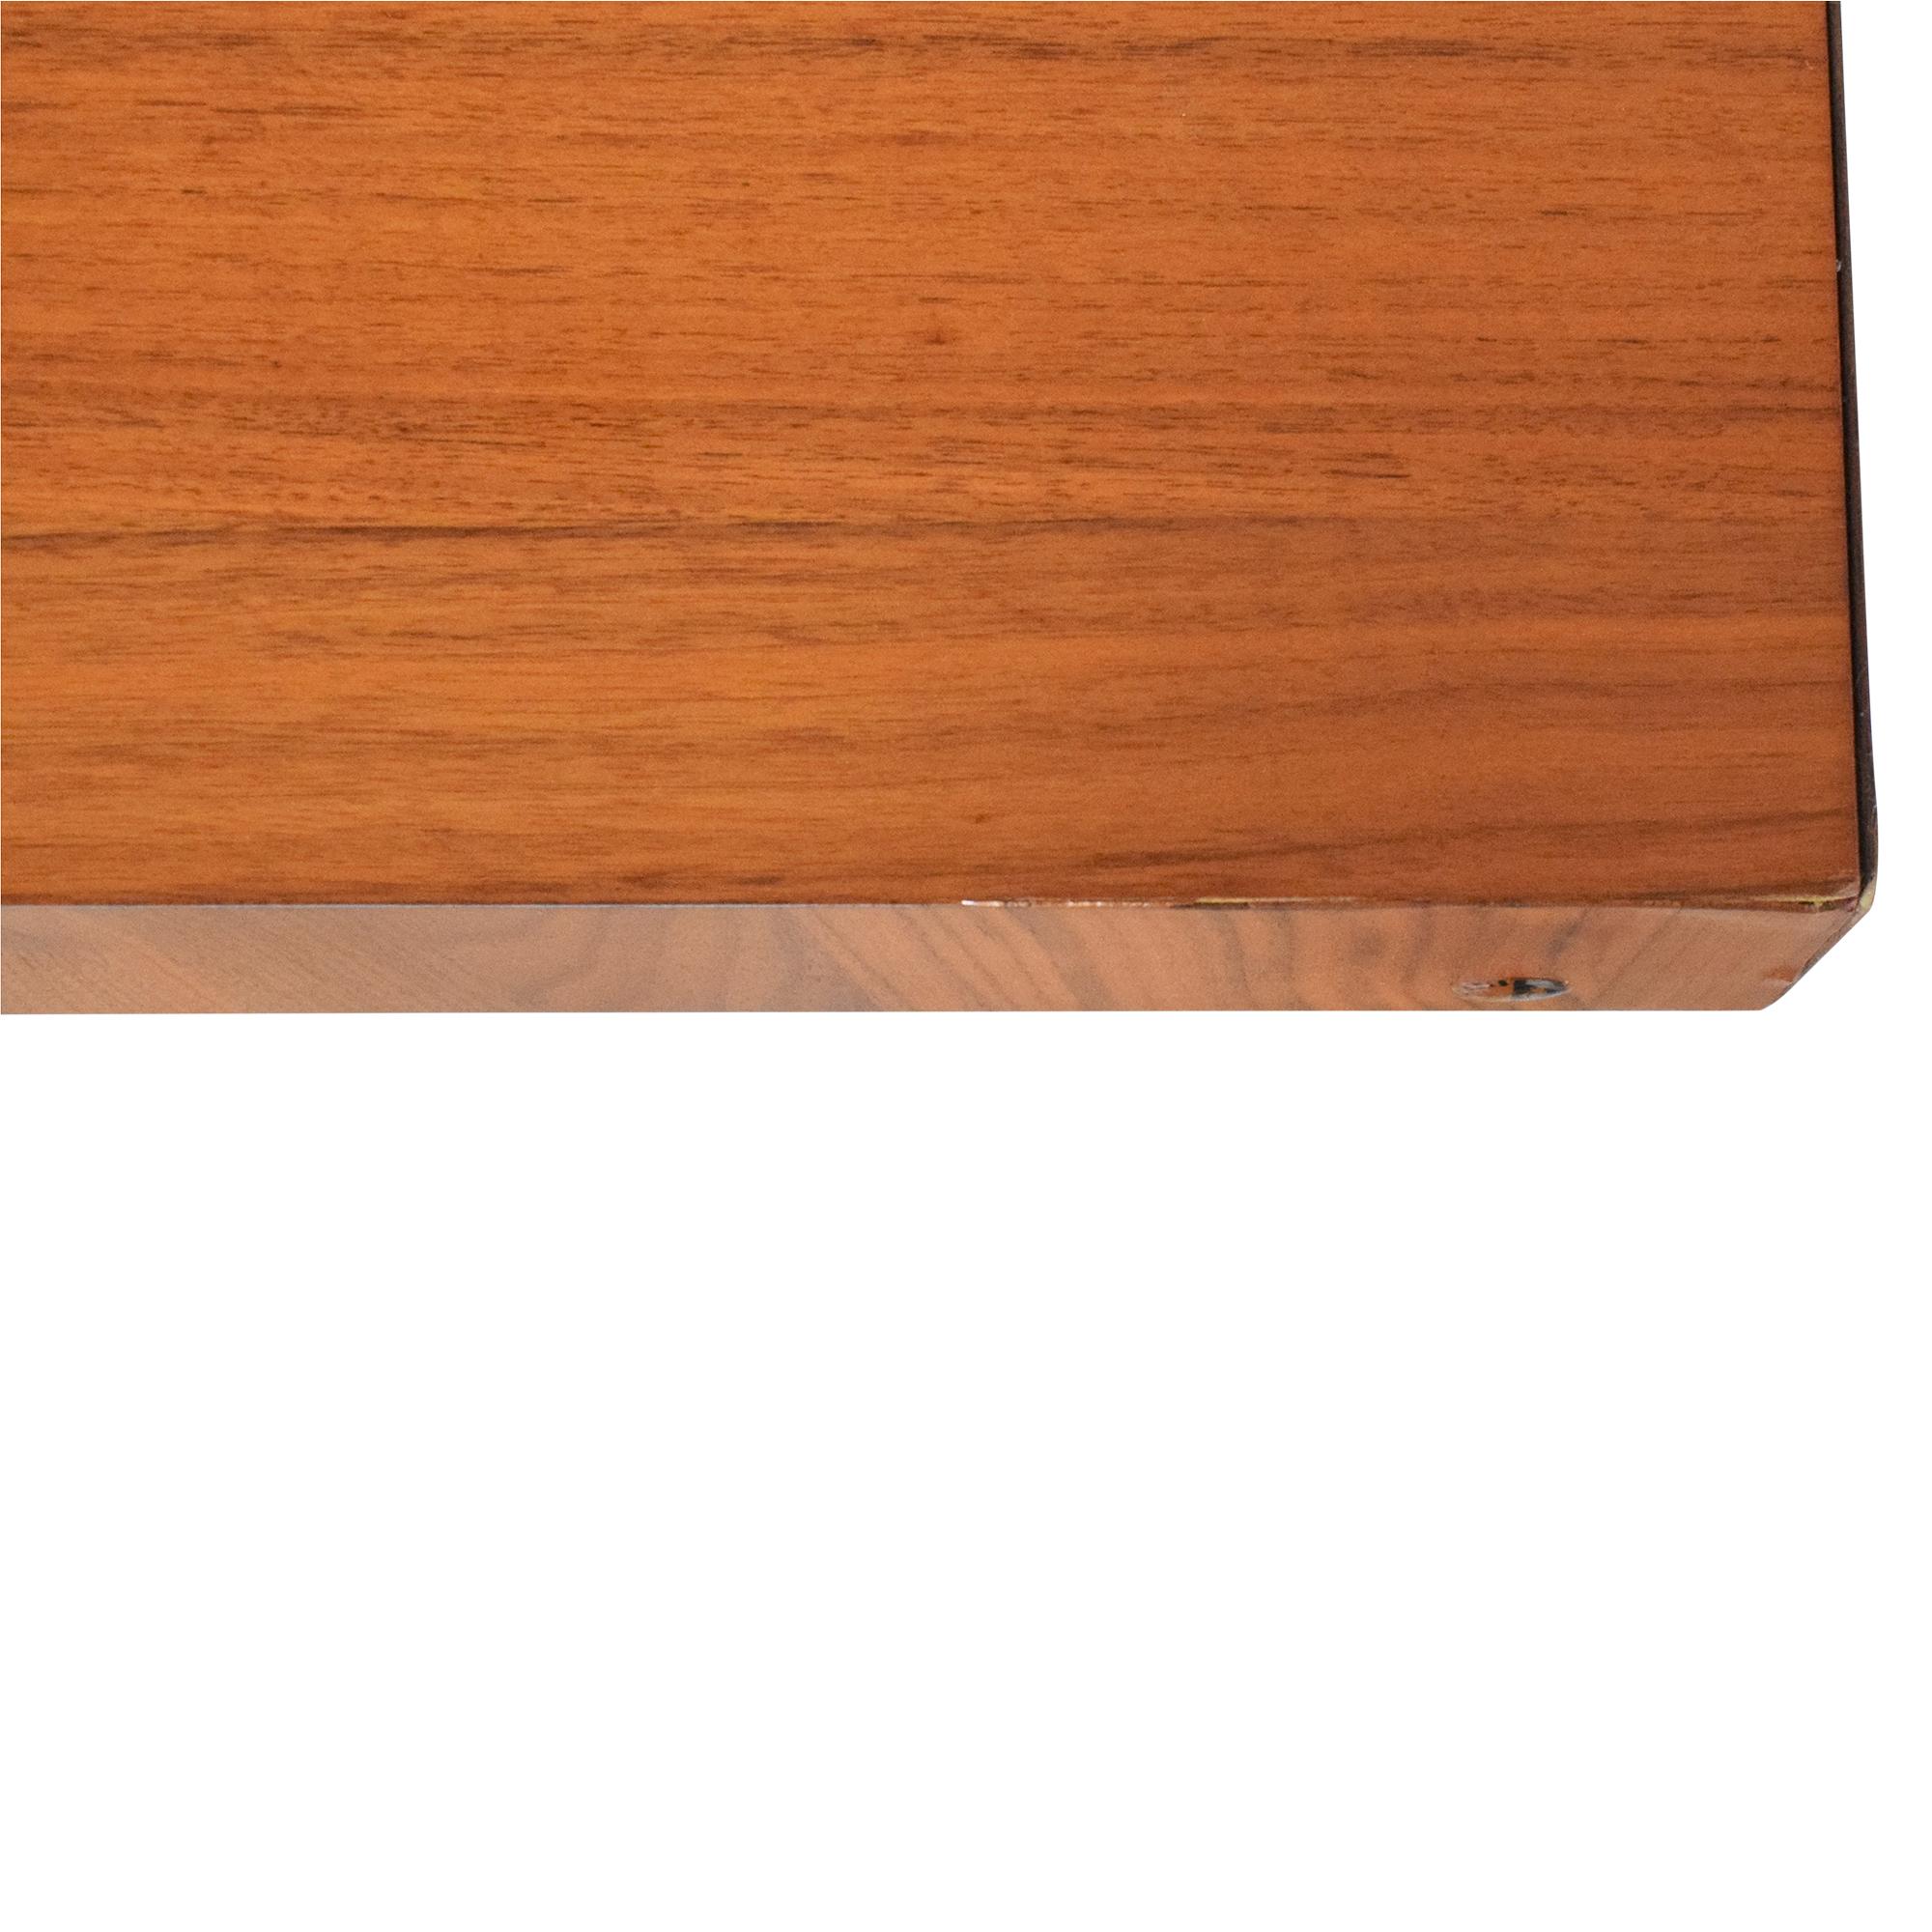 Calligaris Calligaris Parentesi Extendable Dining Table Tables